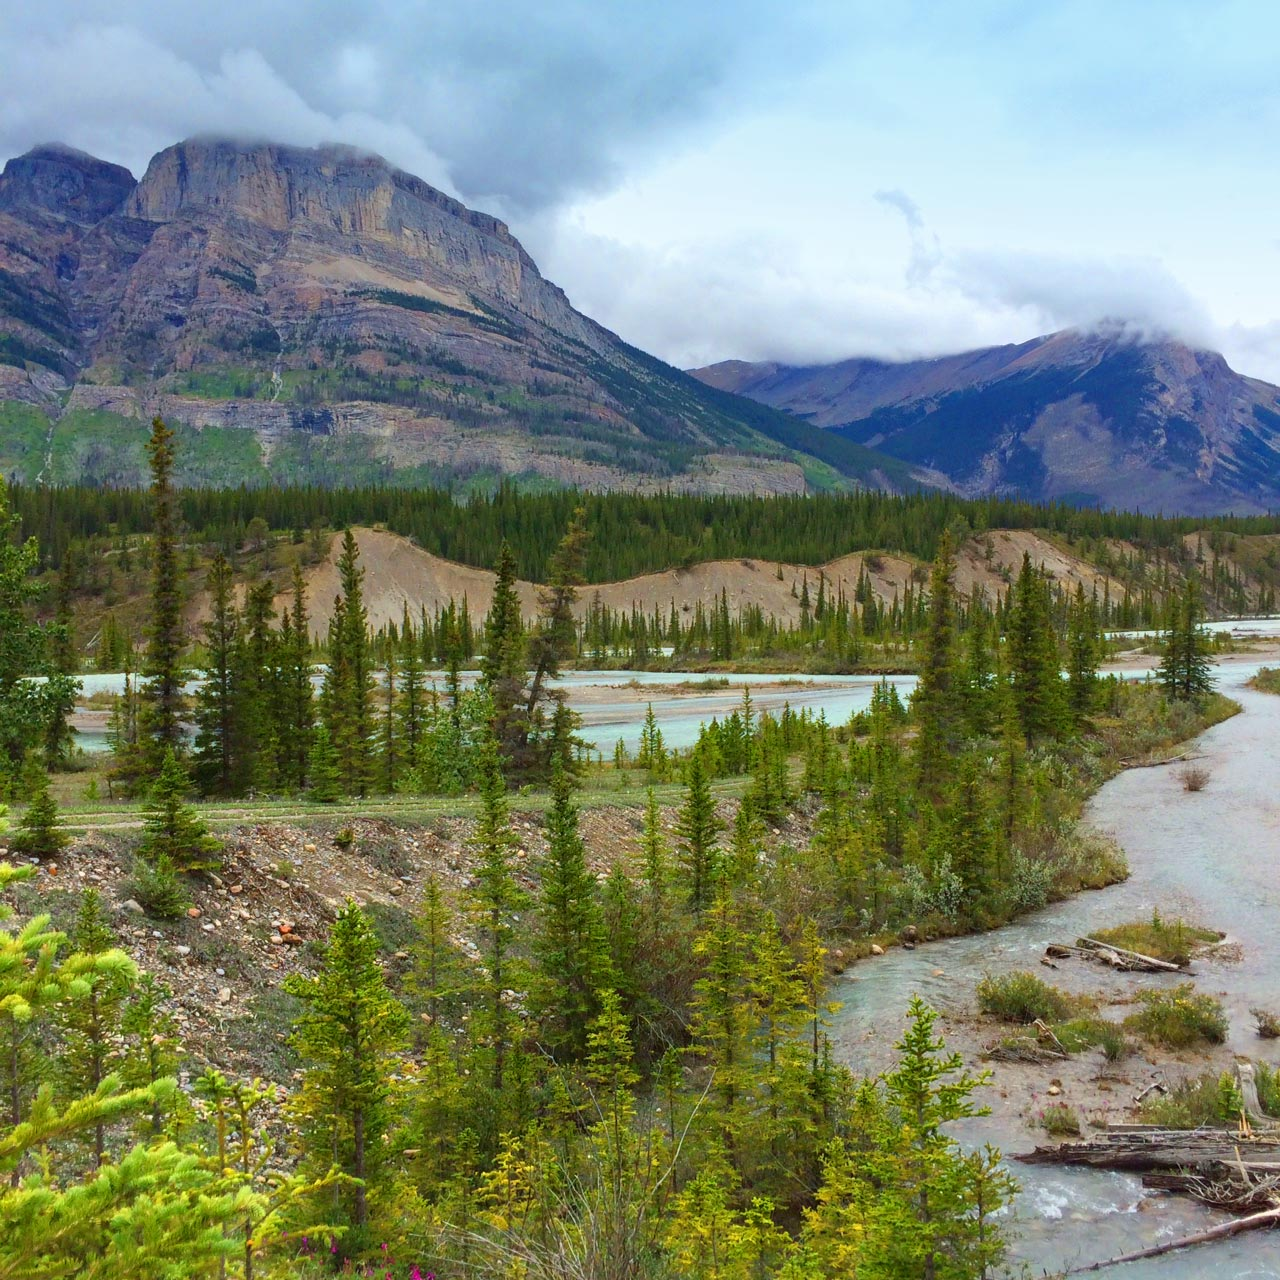 Saskatchewan River Crossing in Alberta